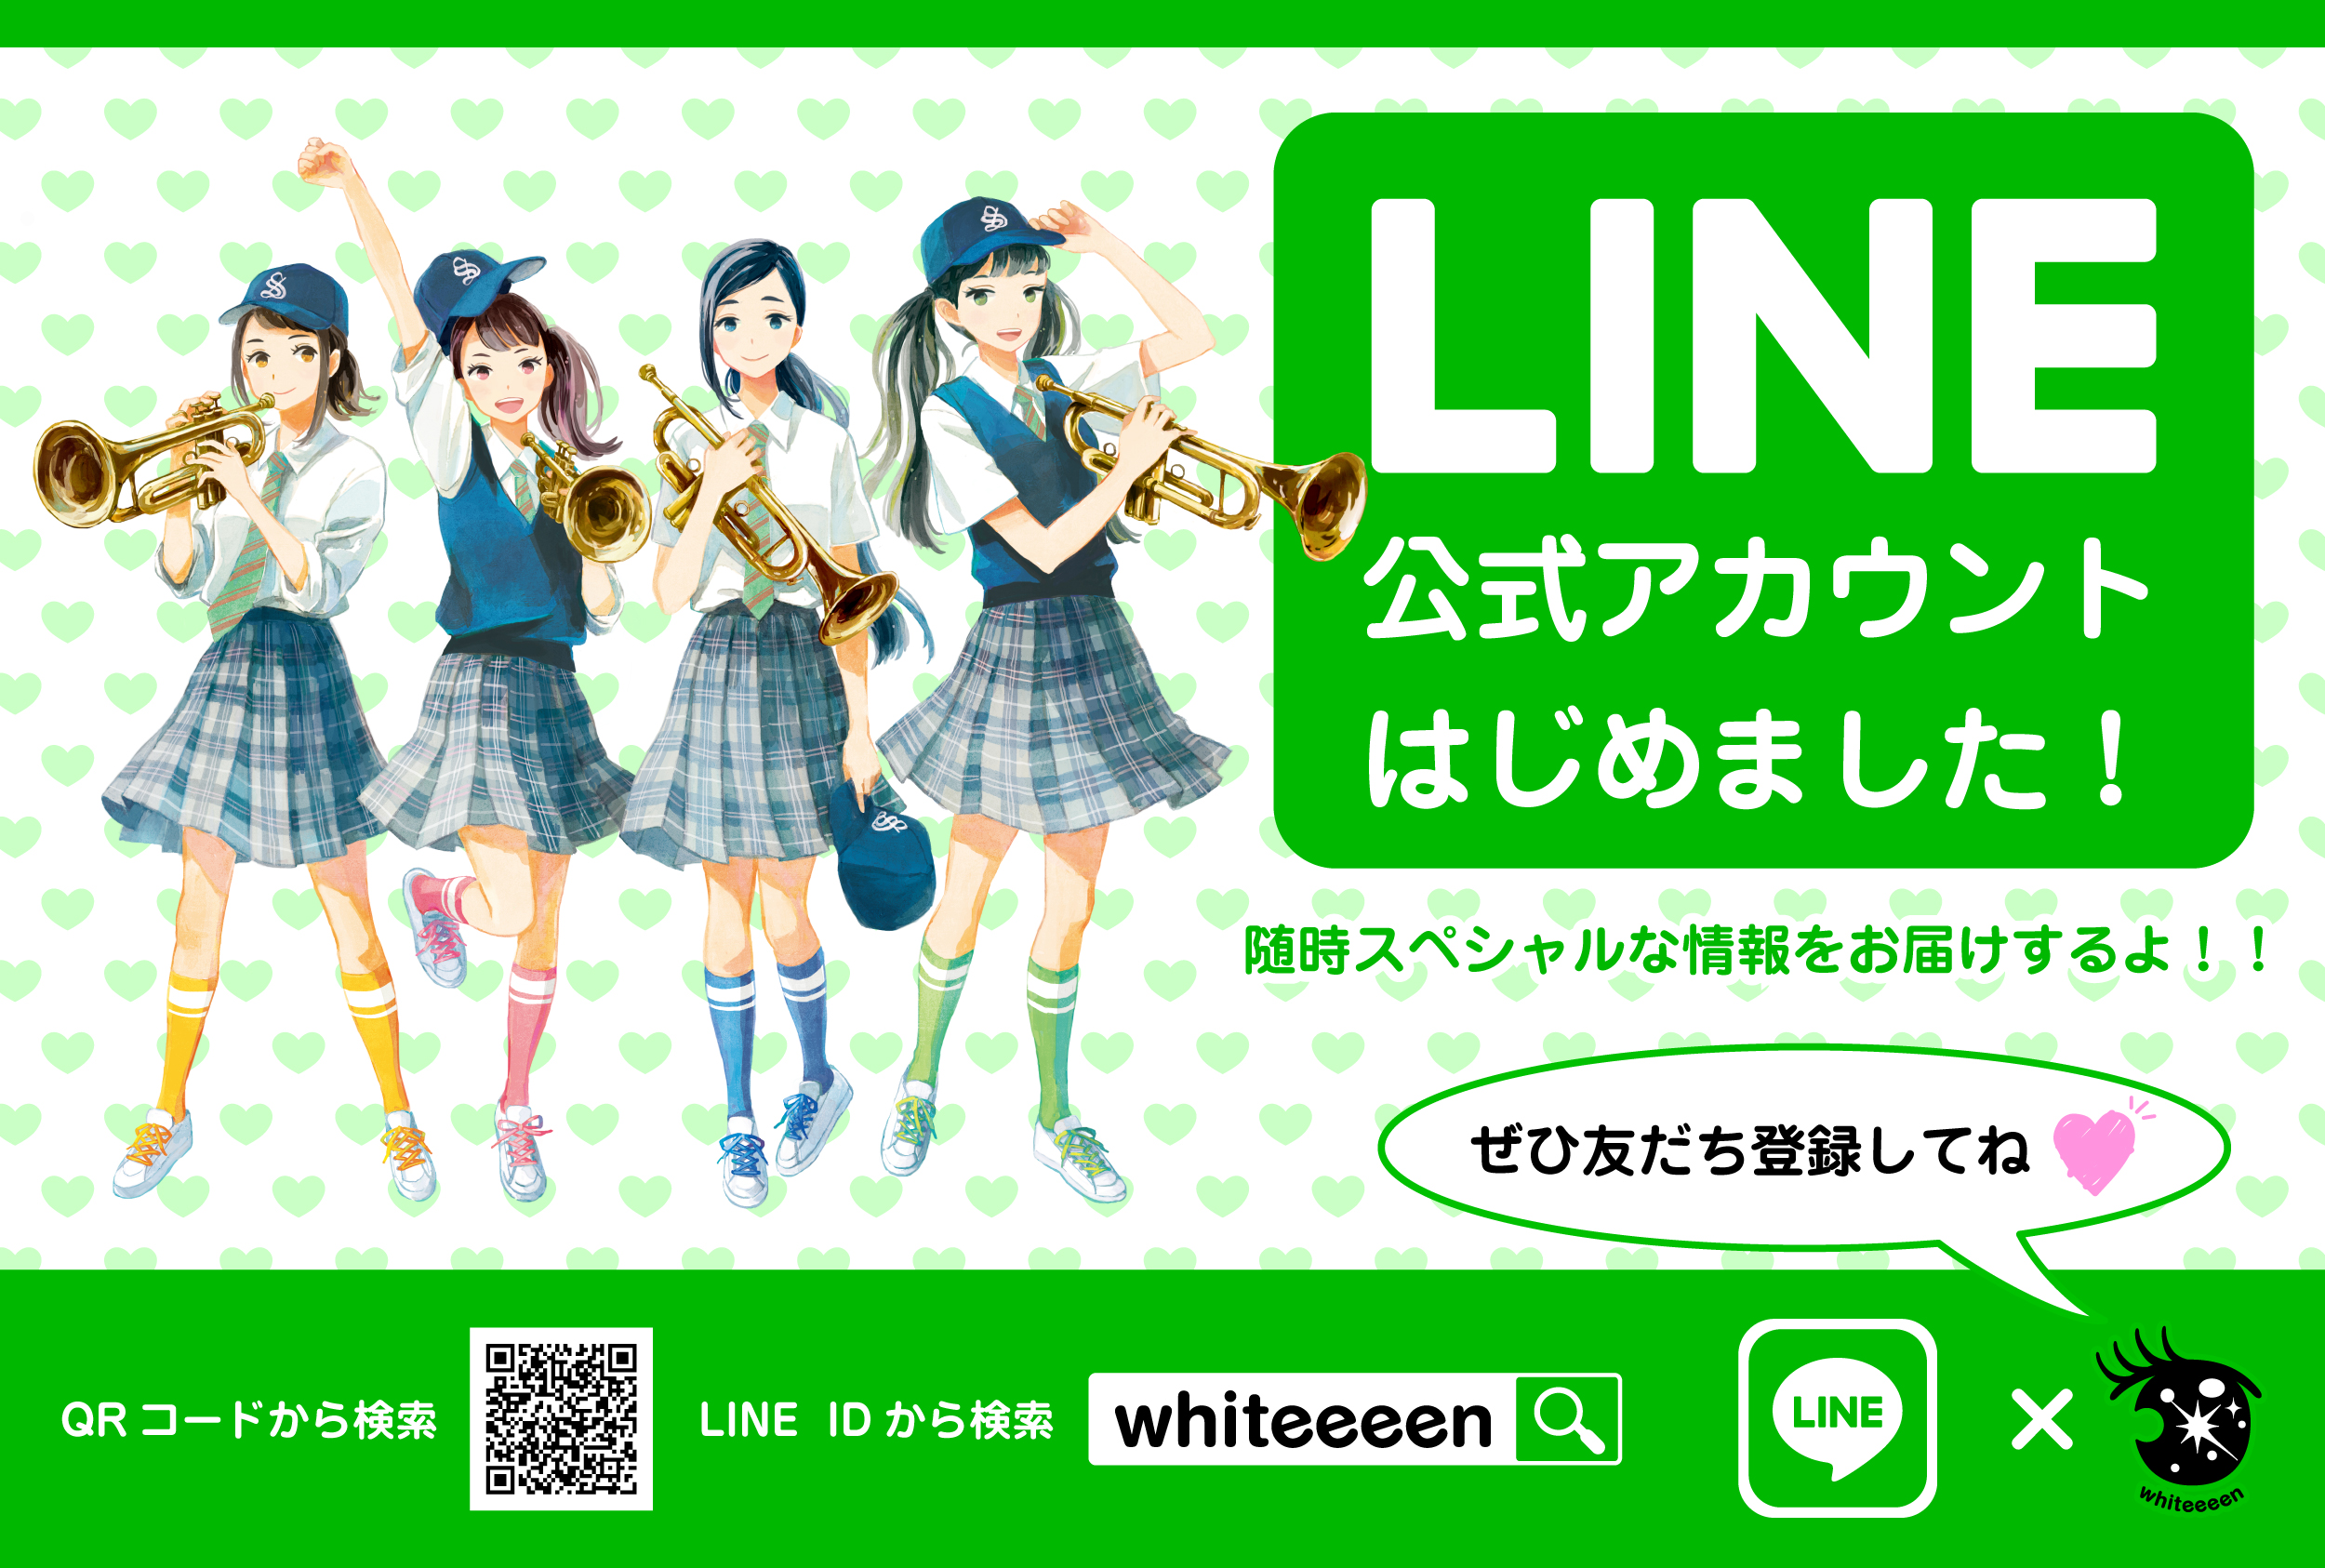 LINEバナー2500x1686